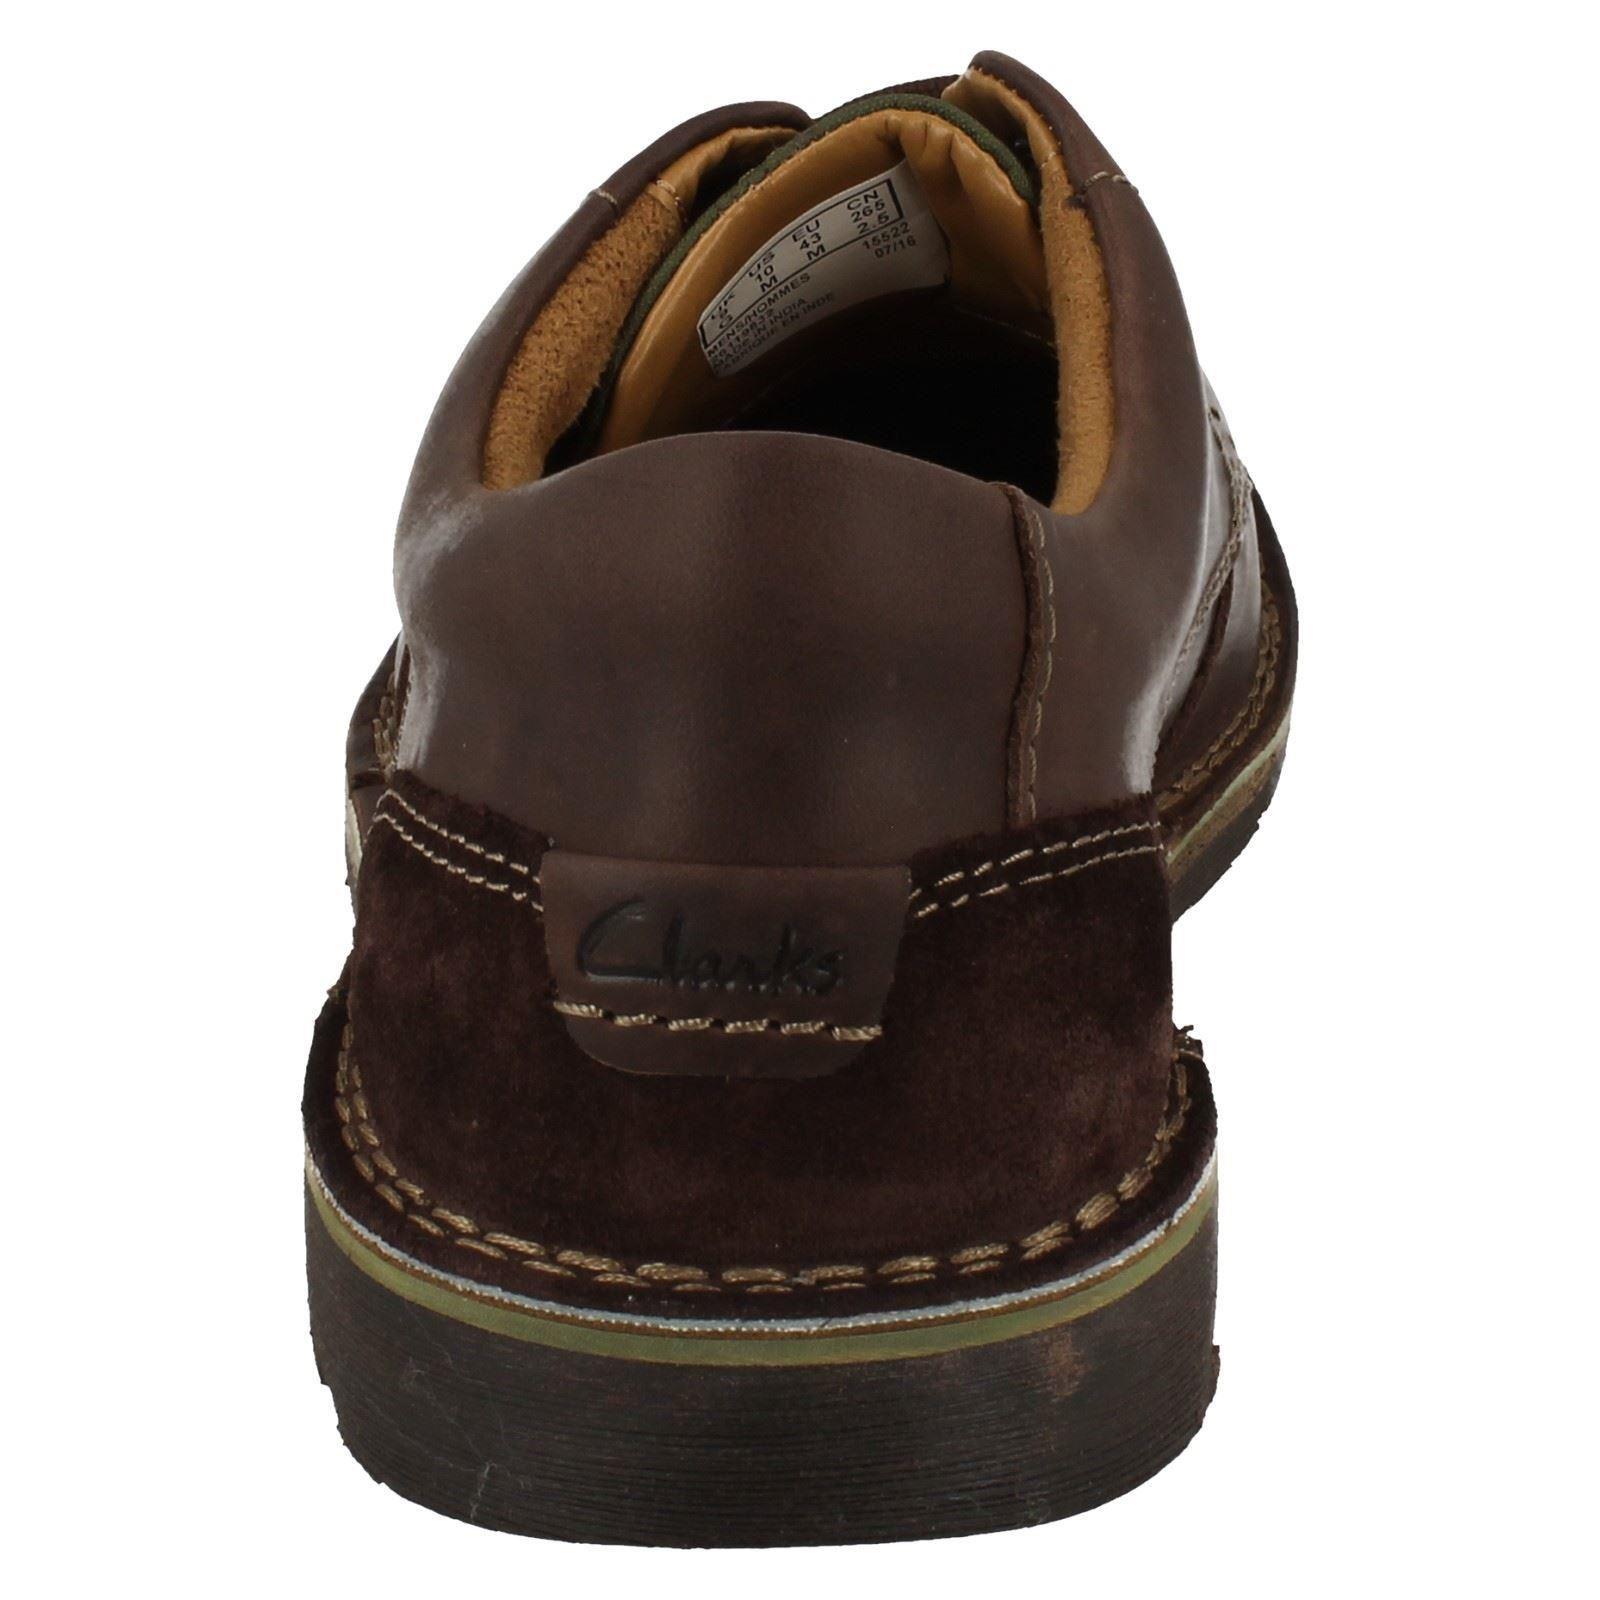 bcc32b374d8 Mens Clarks Casual Lace Up Shoes 'Edgewick Plain'   eBay